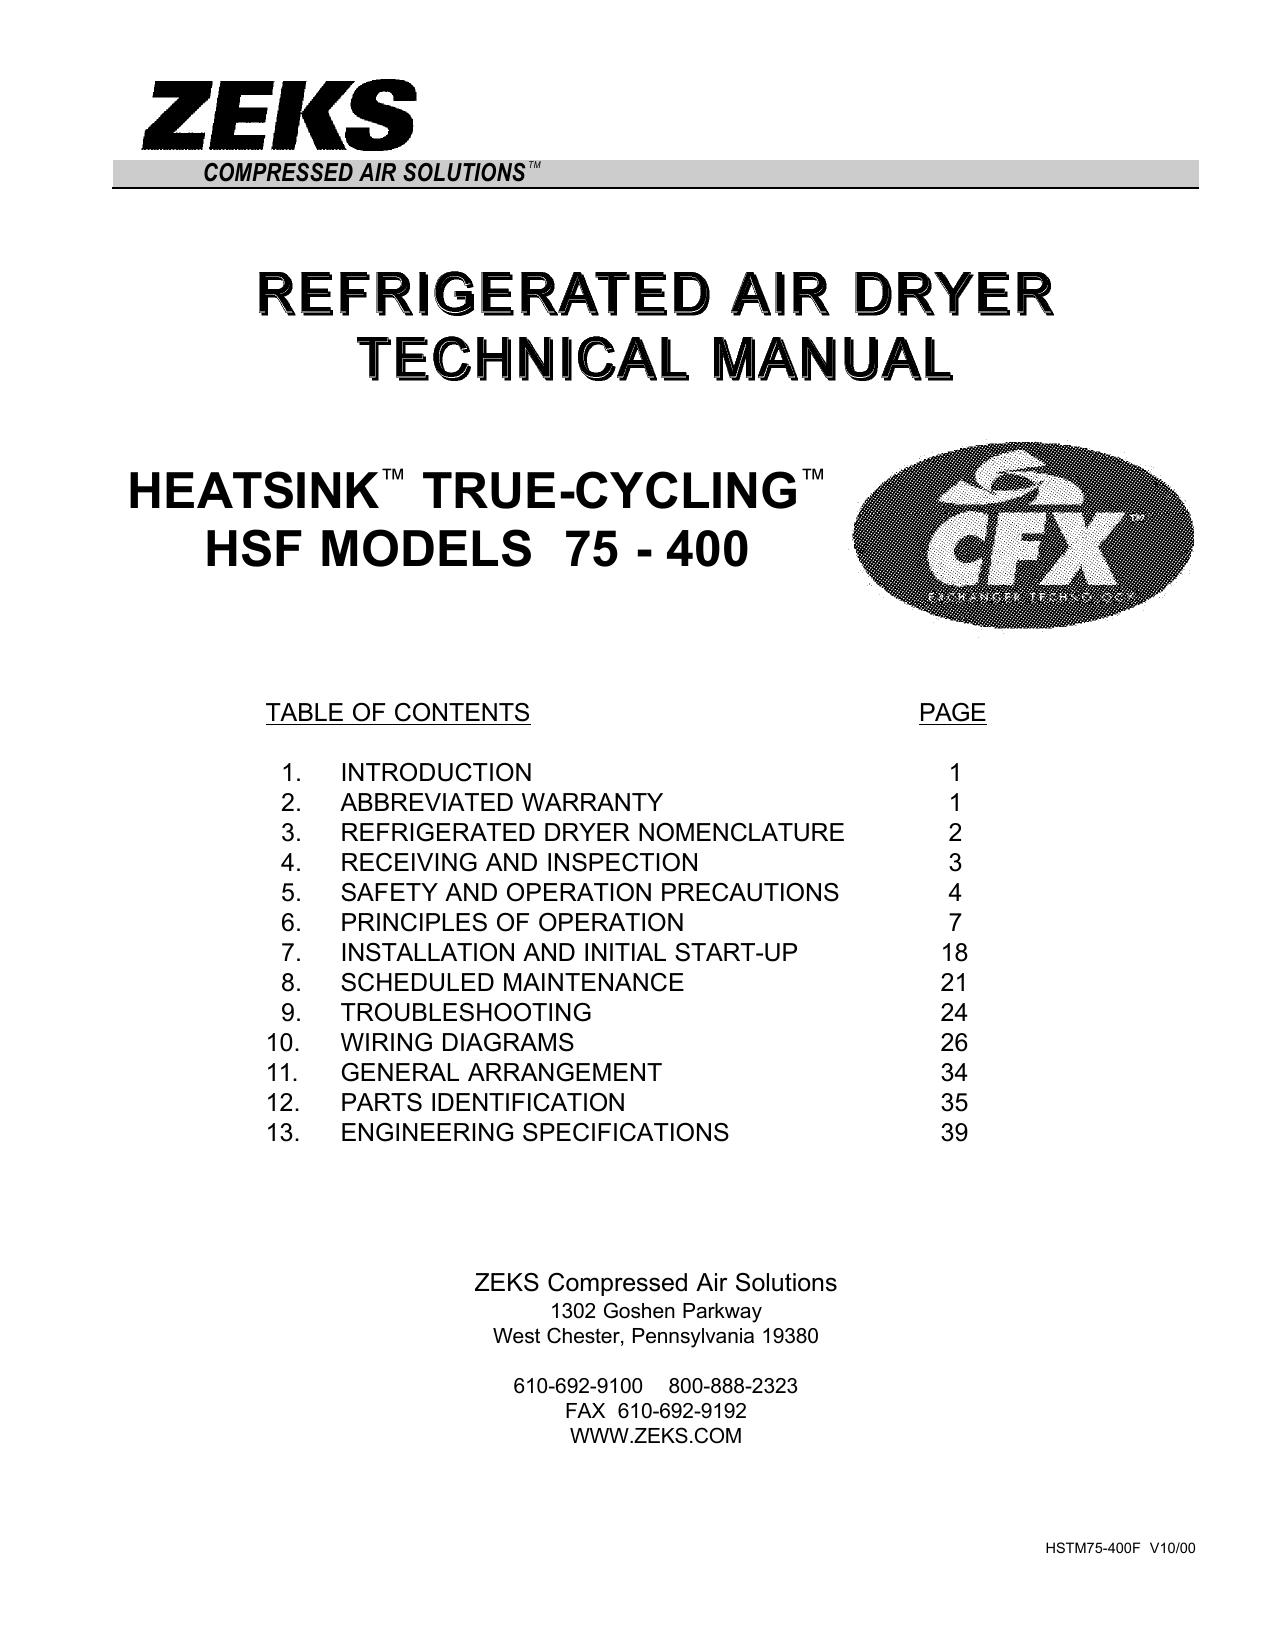 heatsink™ true-cycling™ hsf models 75 - 400